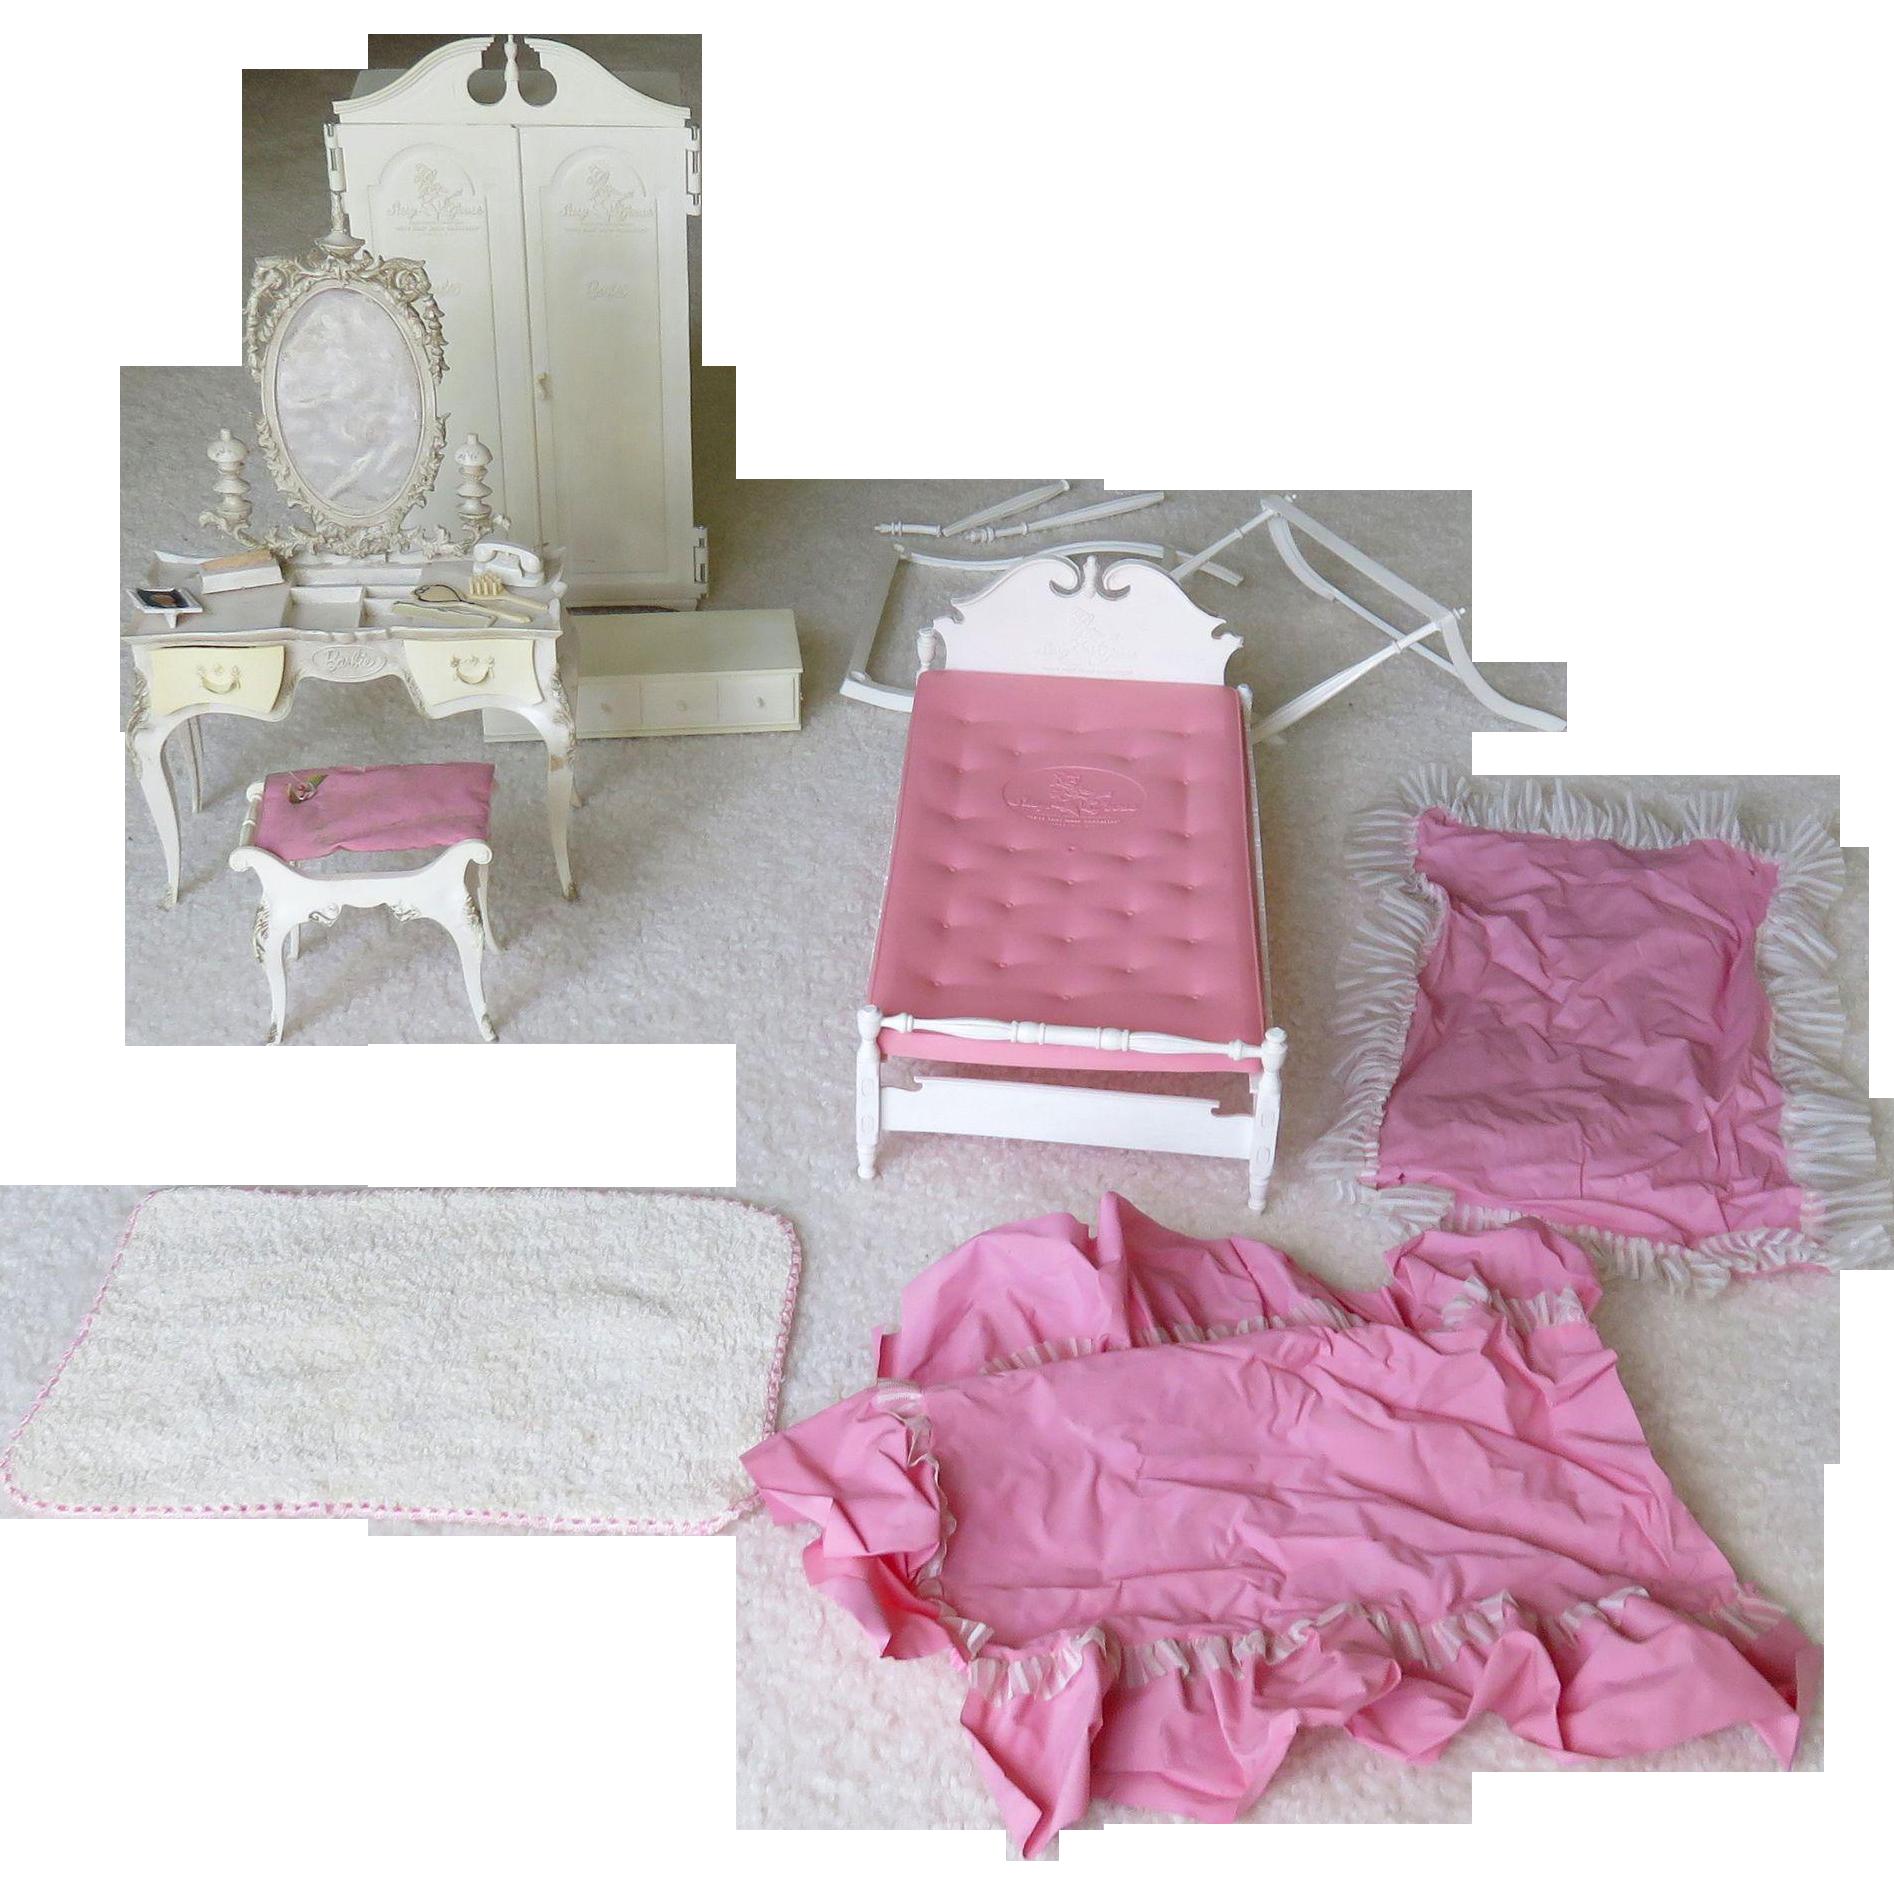 mattel suzy goose barbie bedroom furniture ca 1960 barbie bedroom furniture